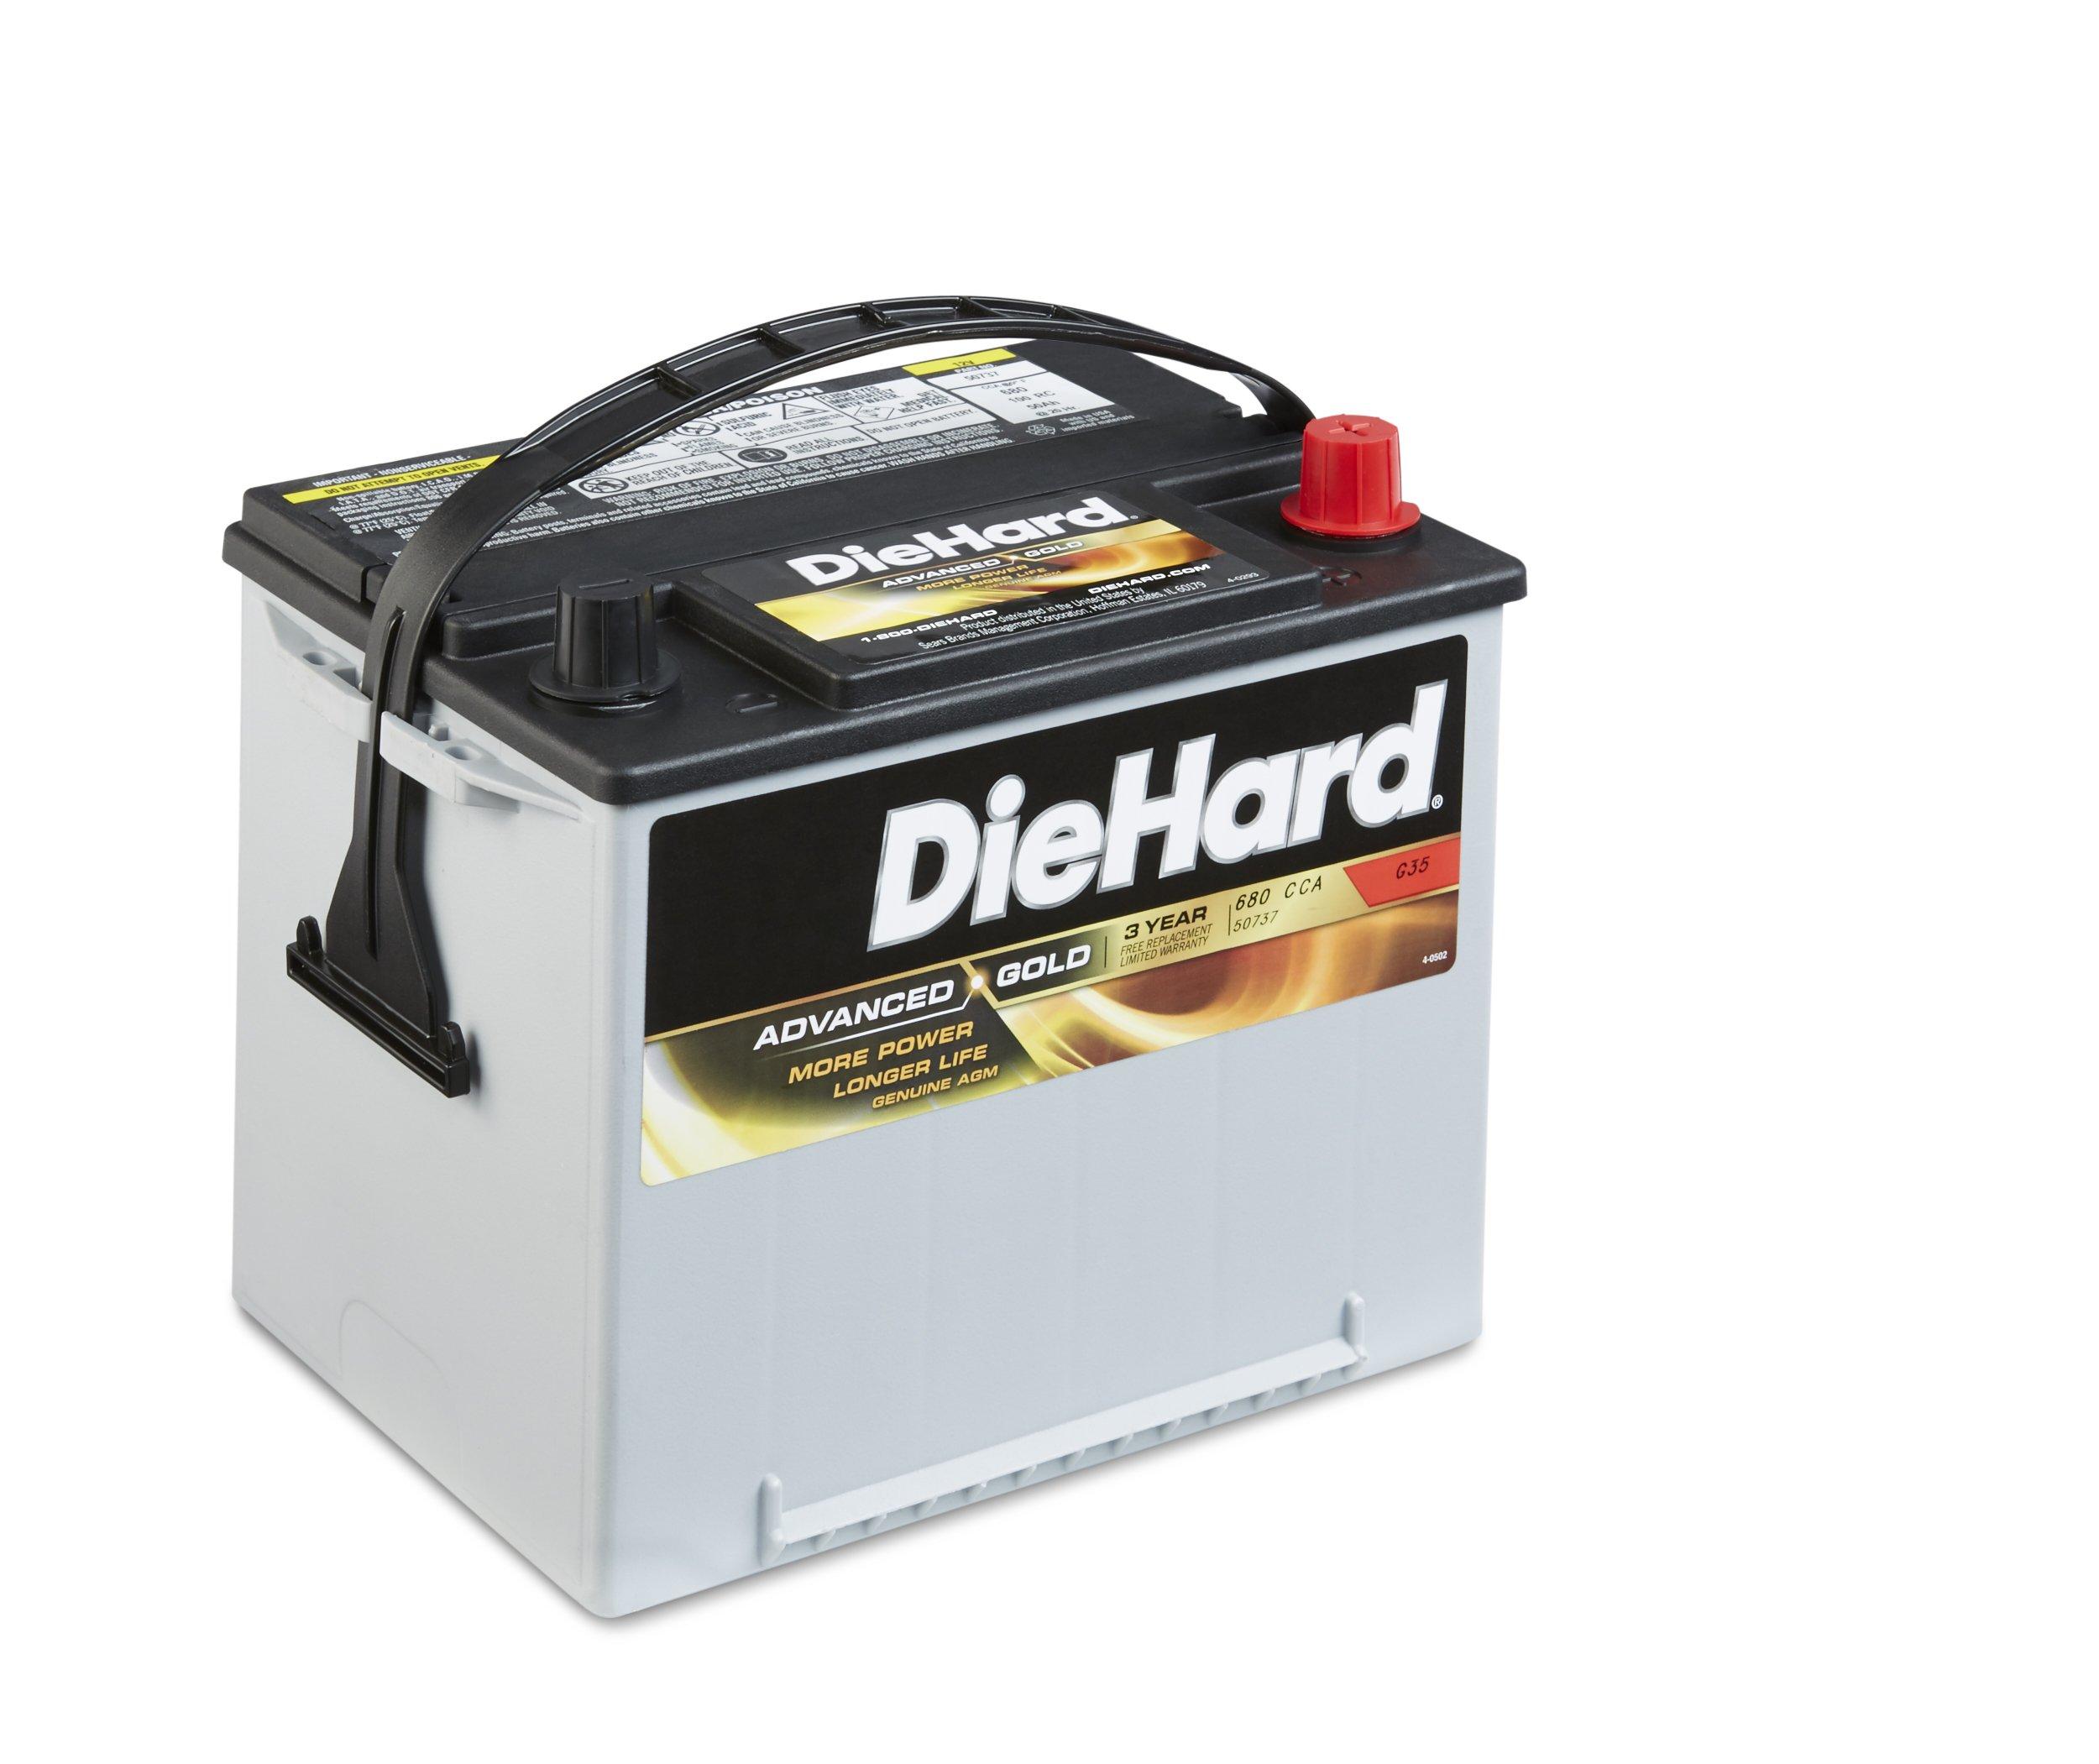 DieHard 38275 Advanced Gold AGM Battery (GP 35) by DieHard (Image #1)